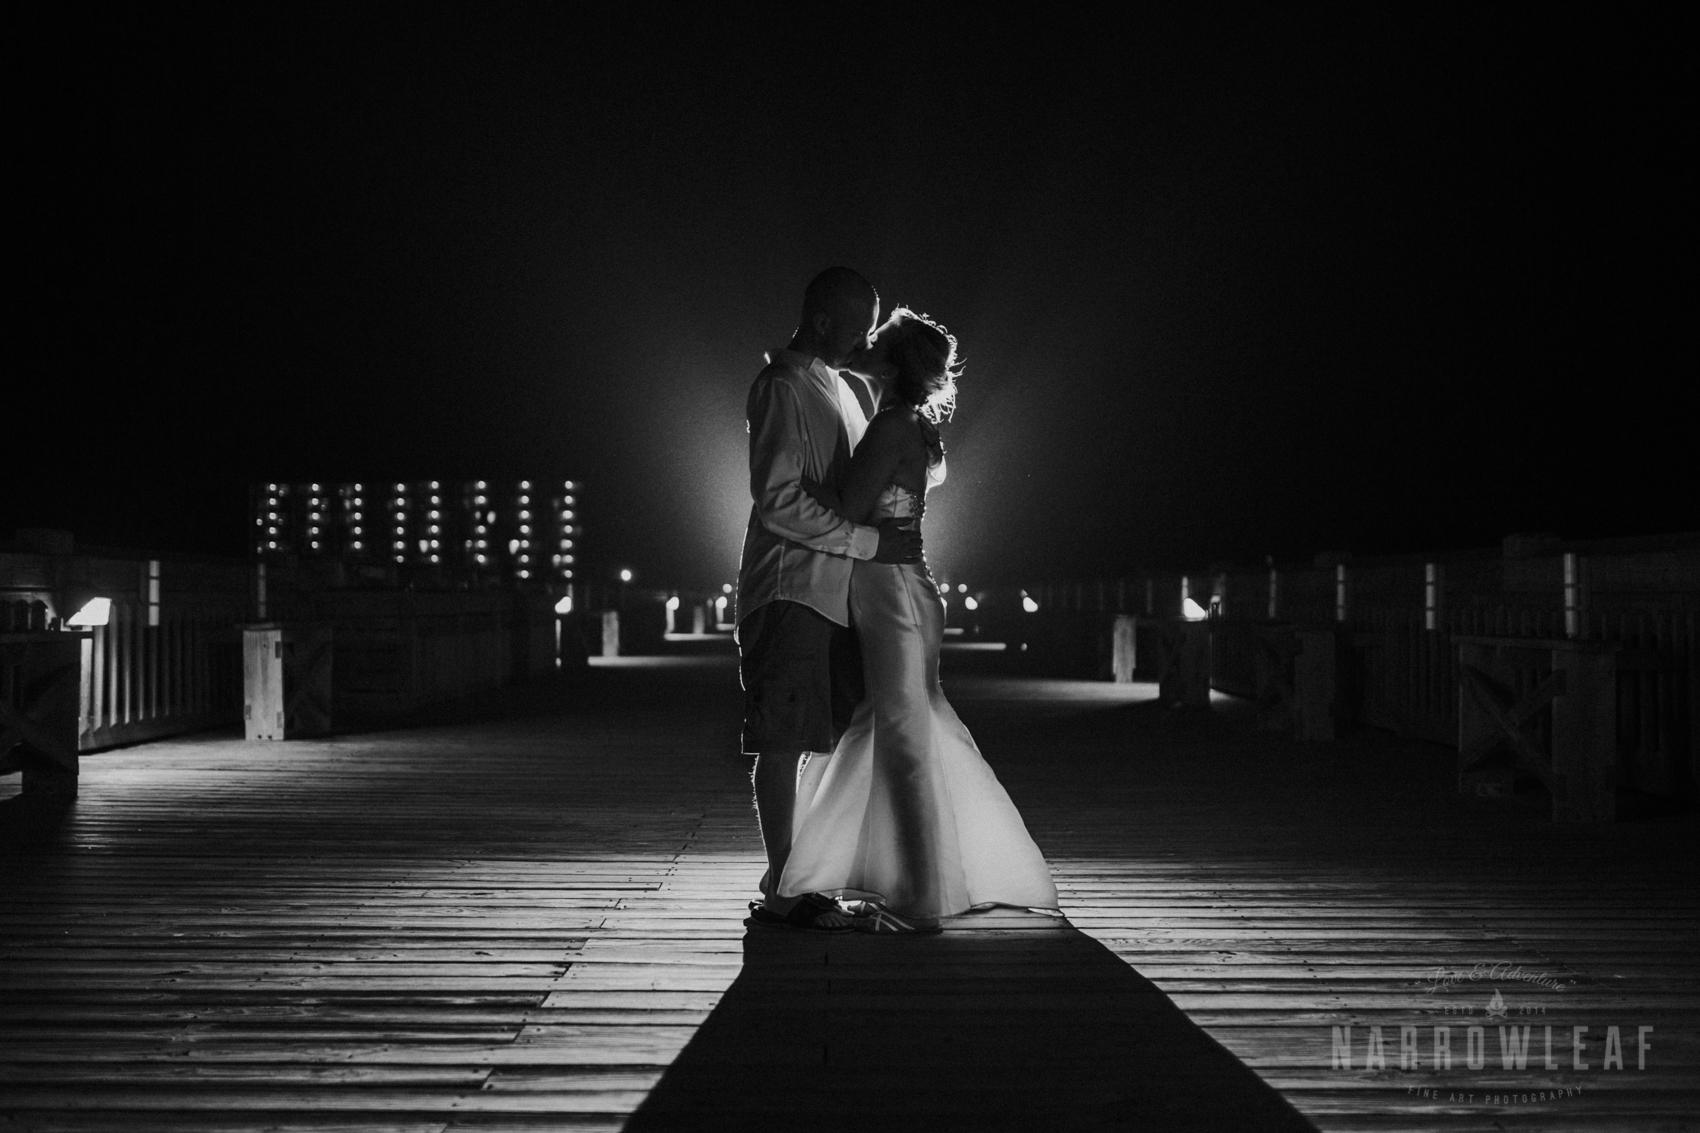 south-carolina-folly-beach-destination-wedding-NarrowLeaf_Love_&_Adventure_Photography-3007.jpg